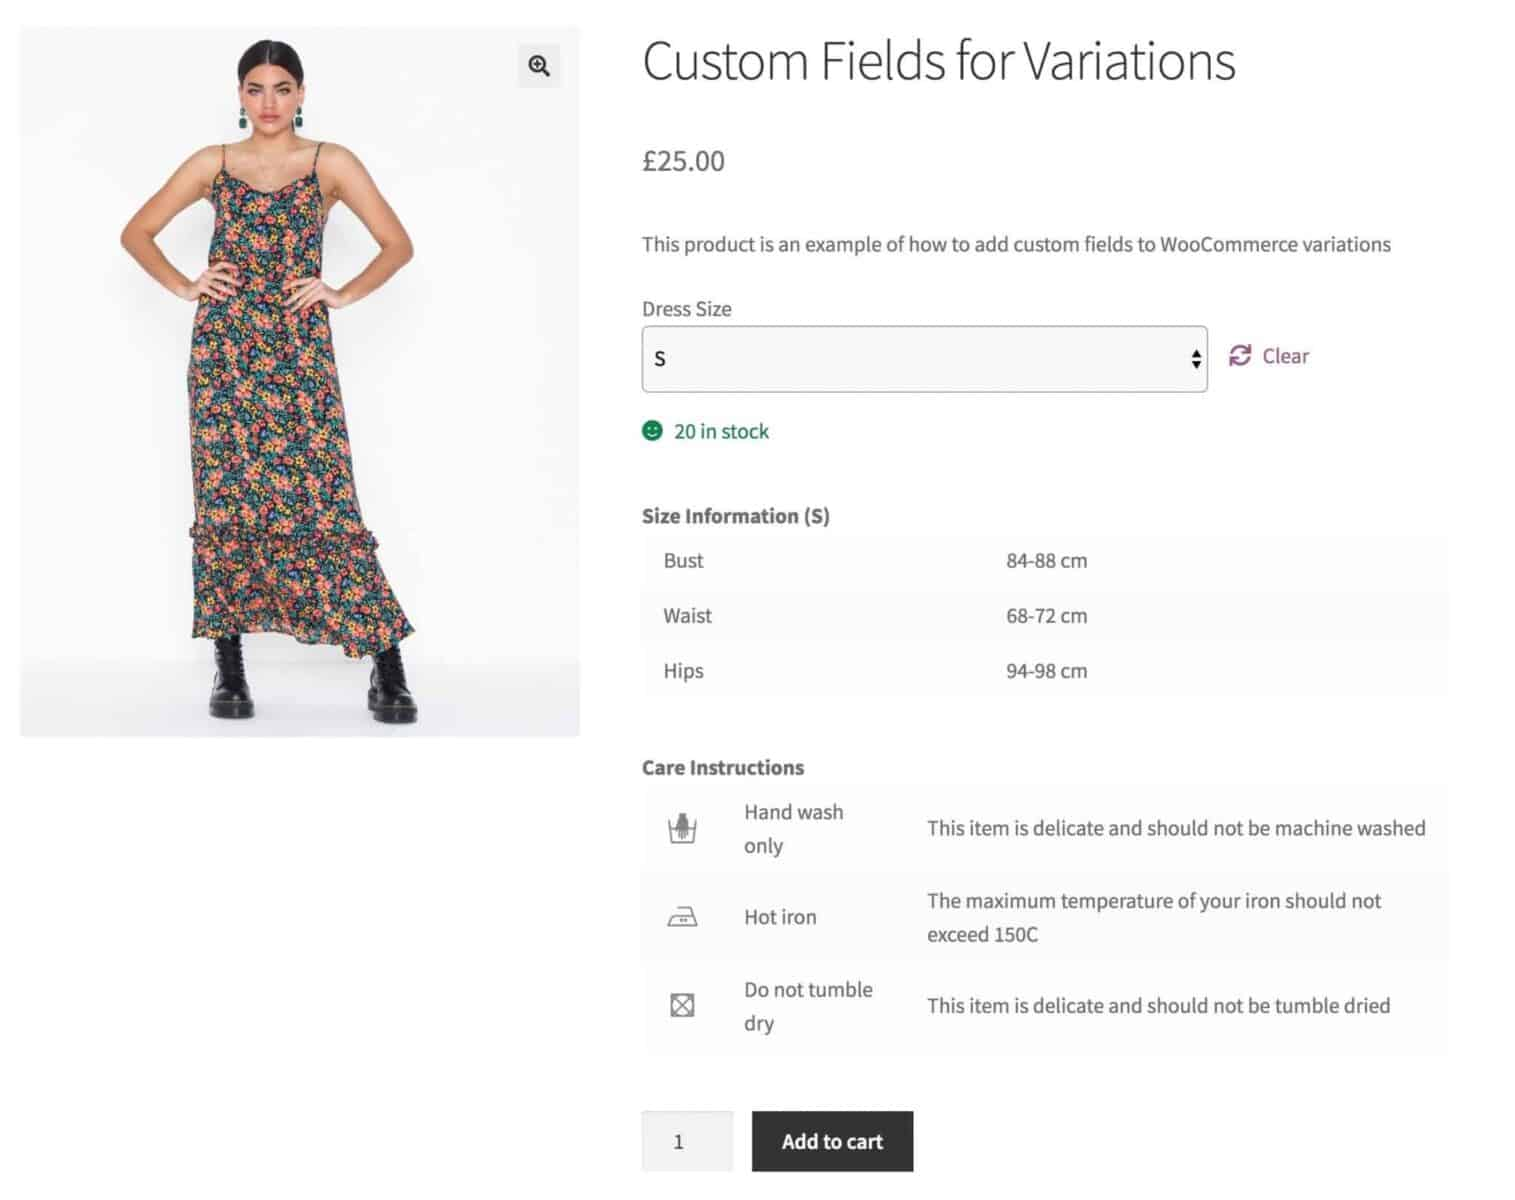 WooCommerce custom fields for variations